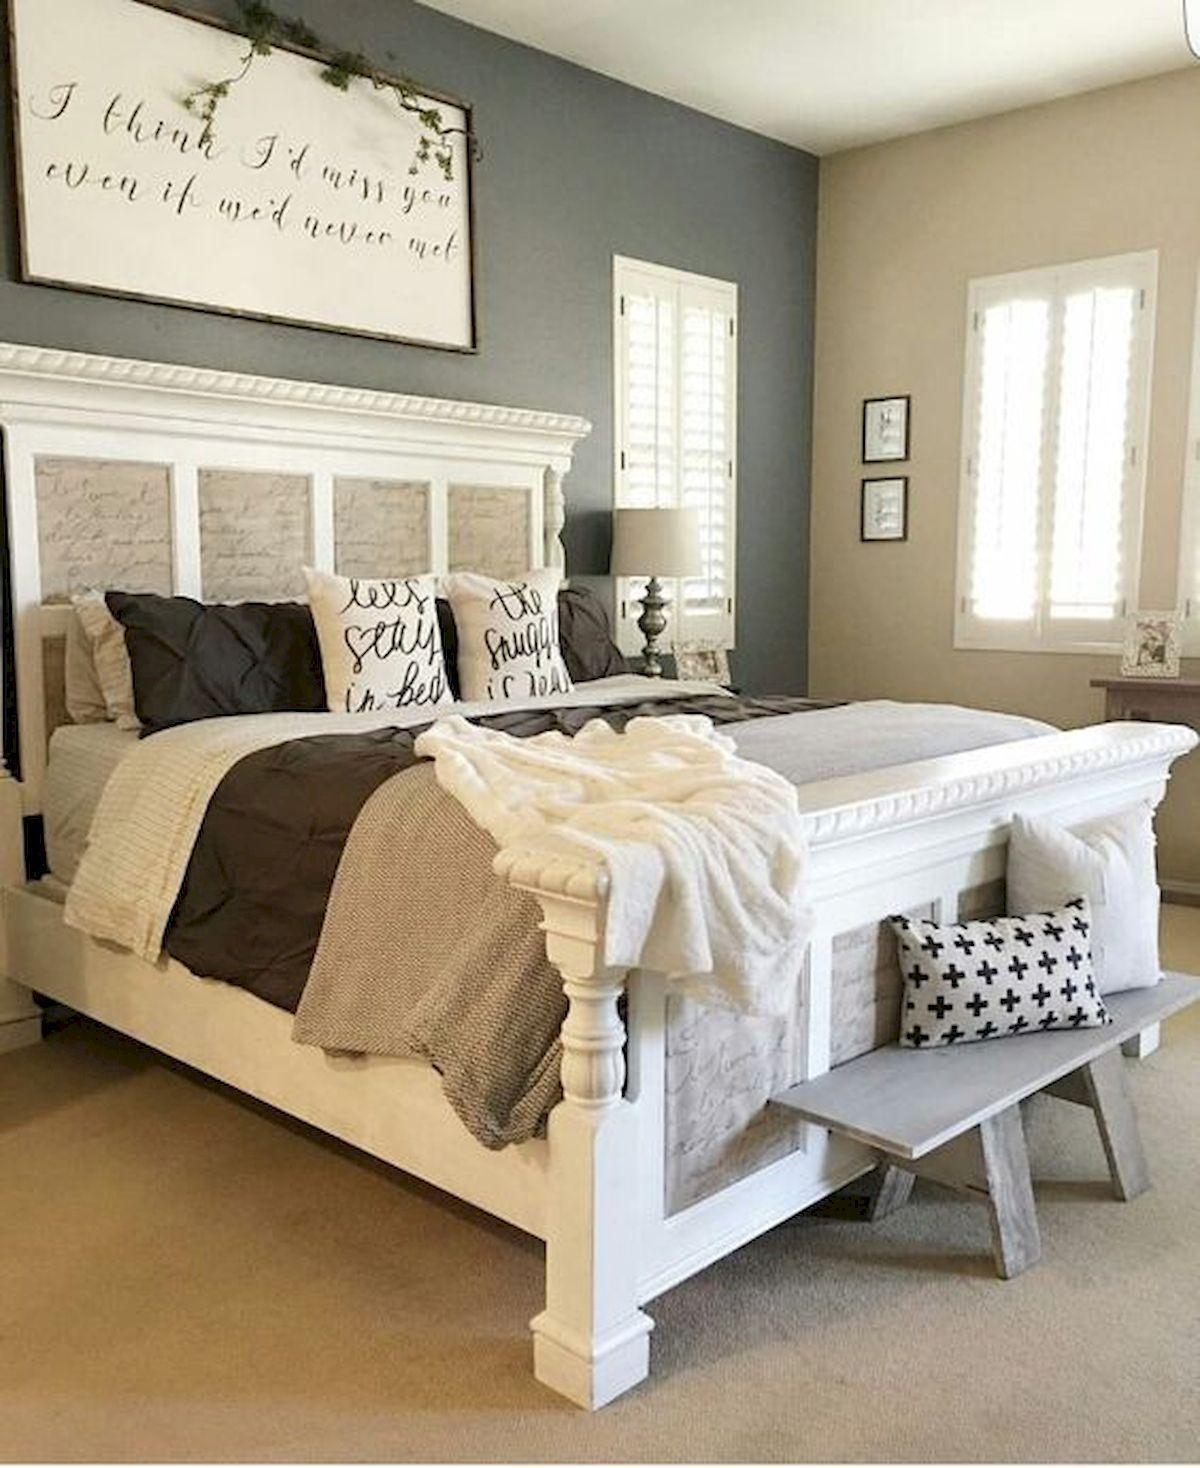 120 home decor for farmhouse master bedroom ideas 6 on modern farmhouse master bedroom ideas id=33249